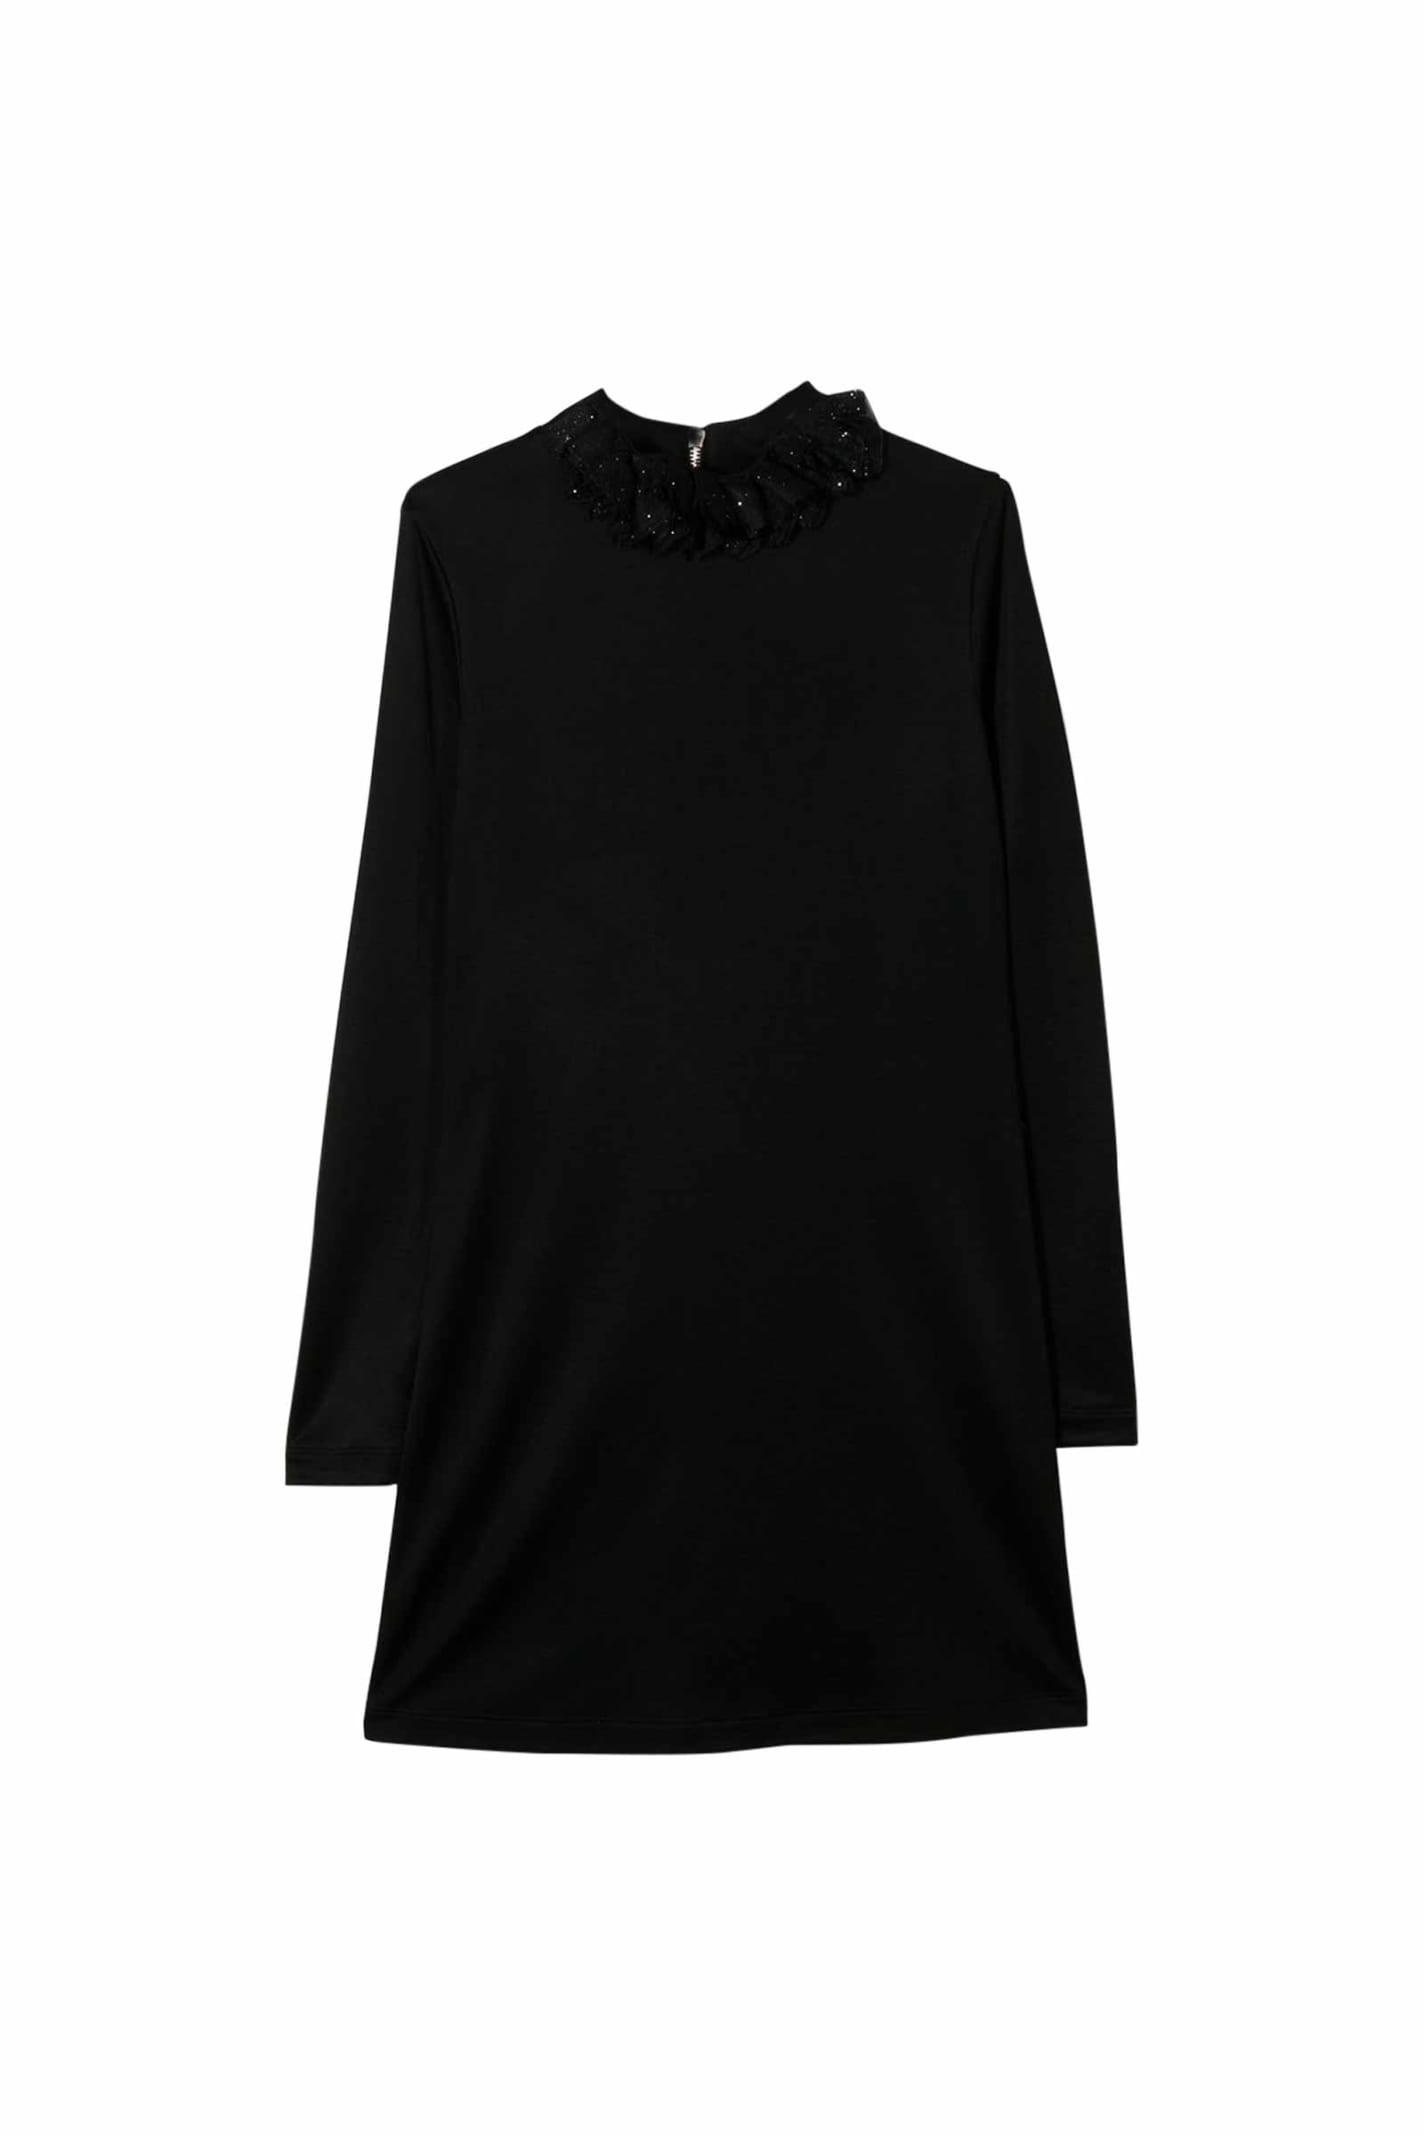 Buy Balmain Dress With Glazing Neck online, shop Balmain with free shipping